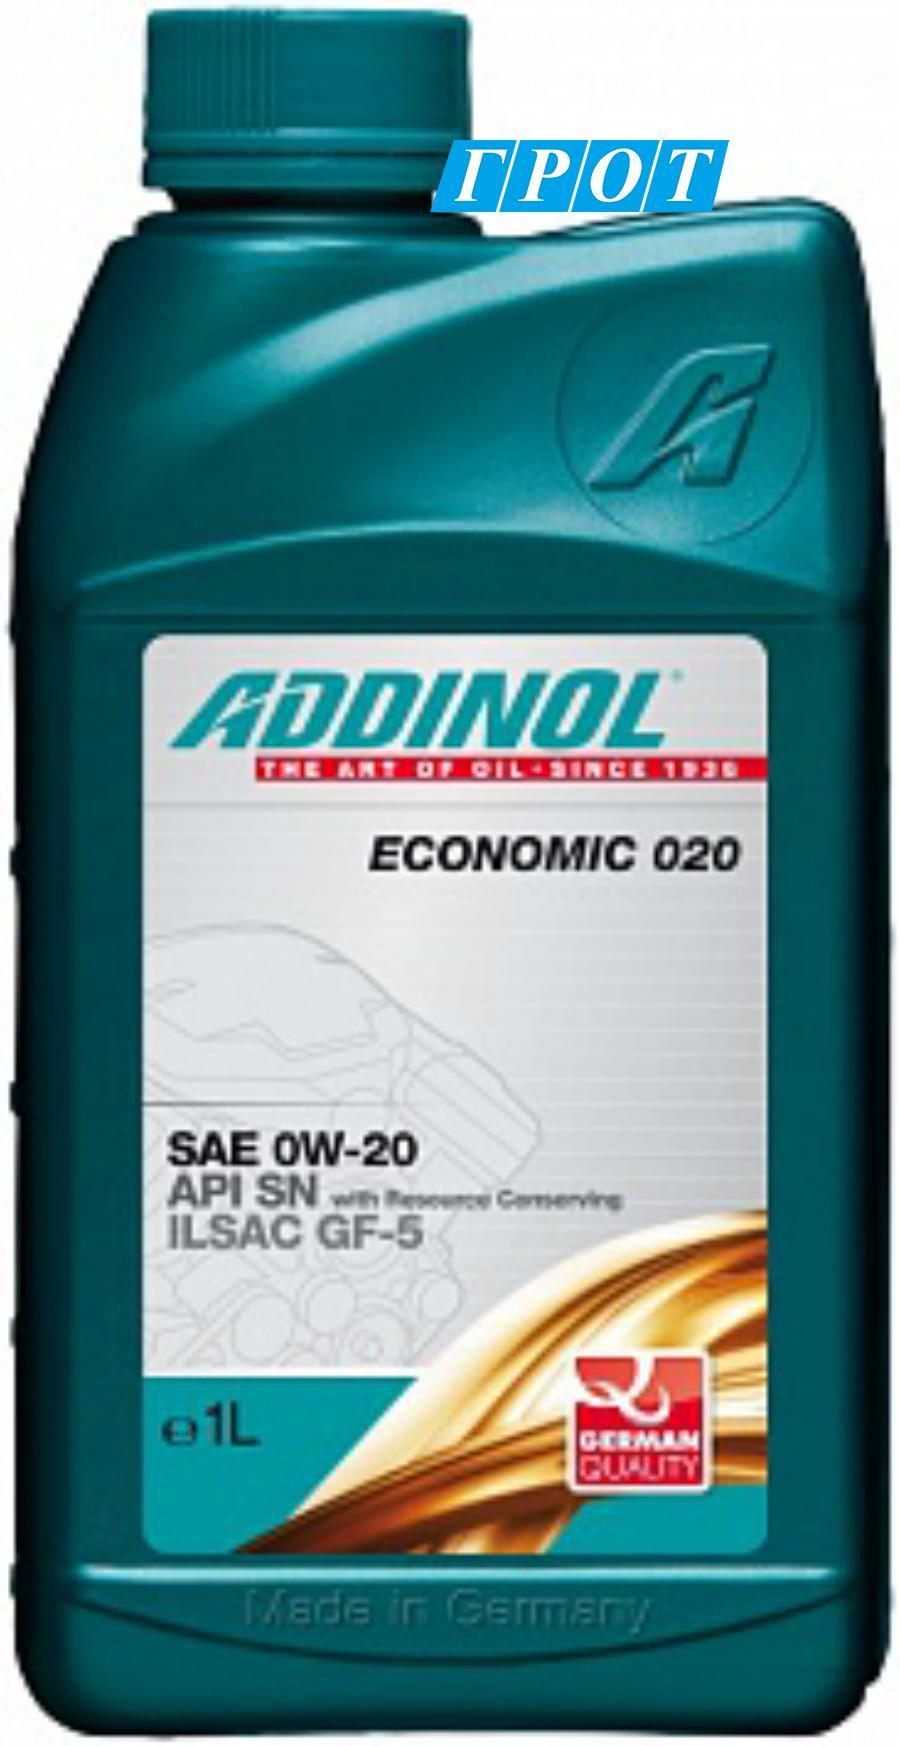 Масло моторное синтетическое Economic 020 0W-20, 1л